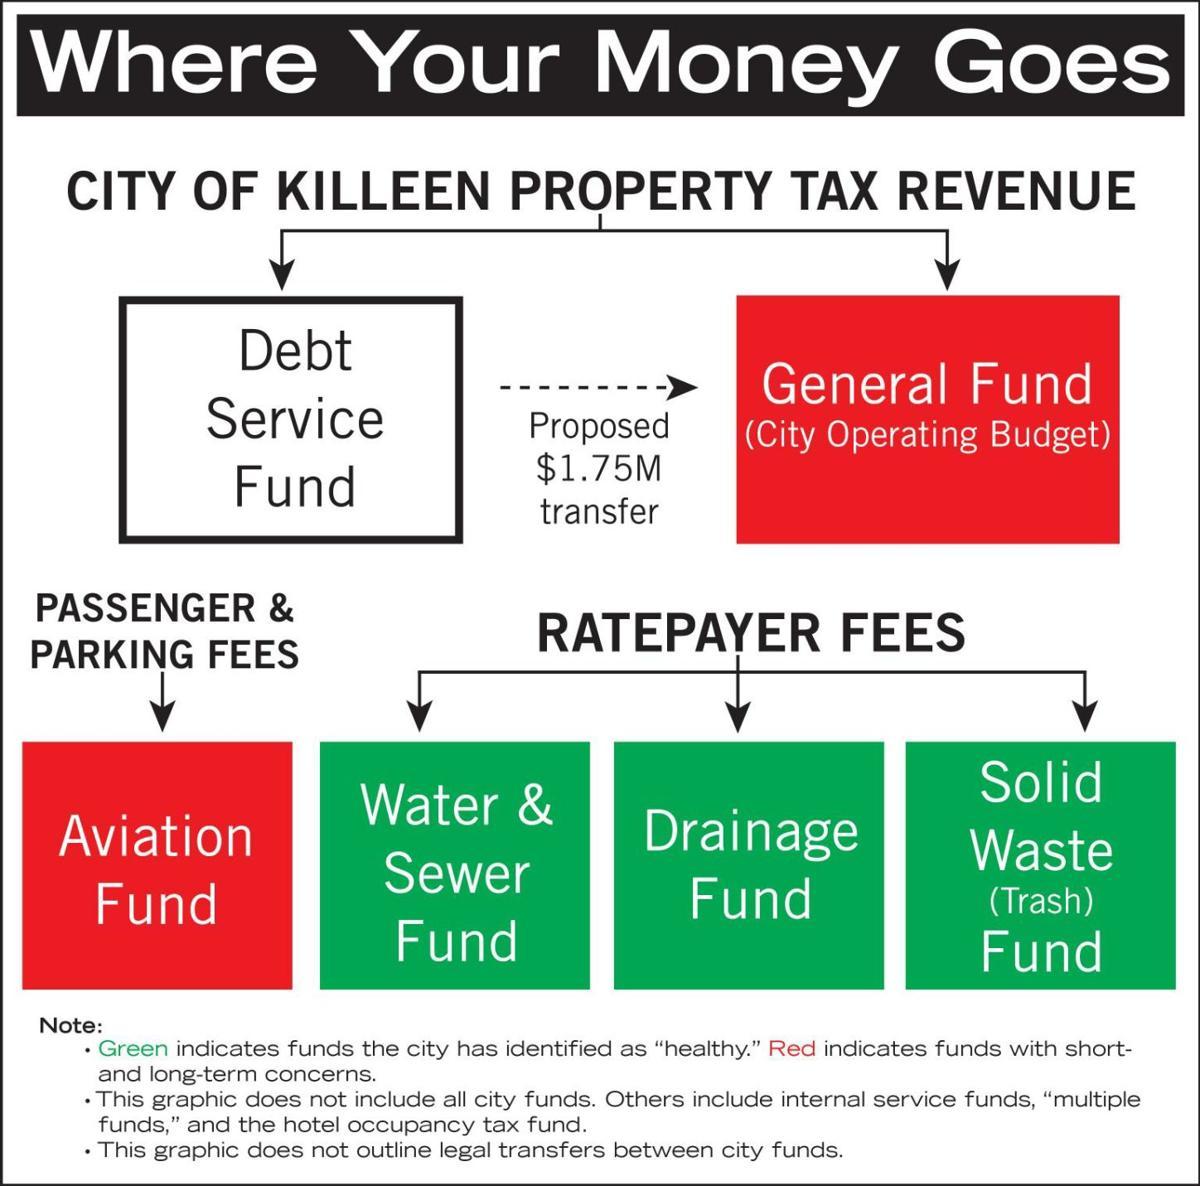 Killeen budget process